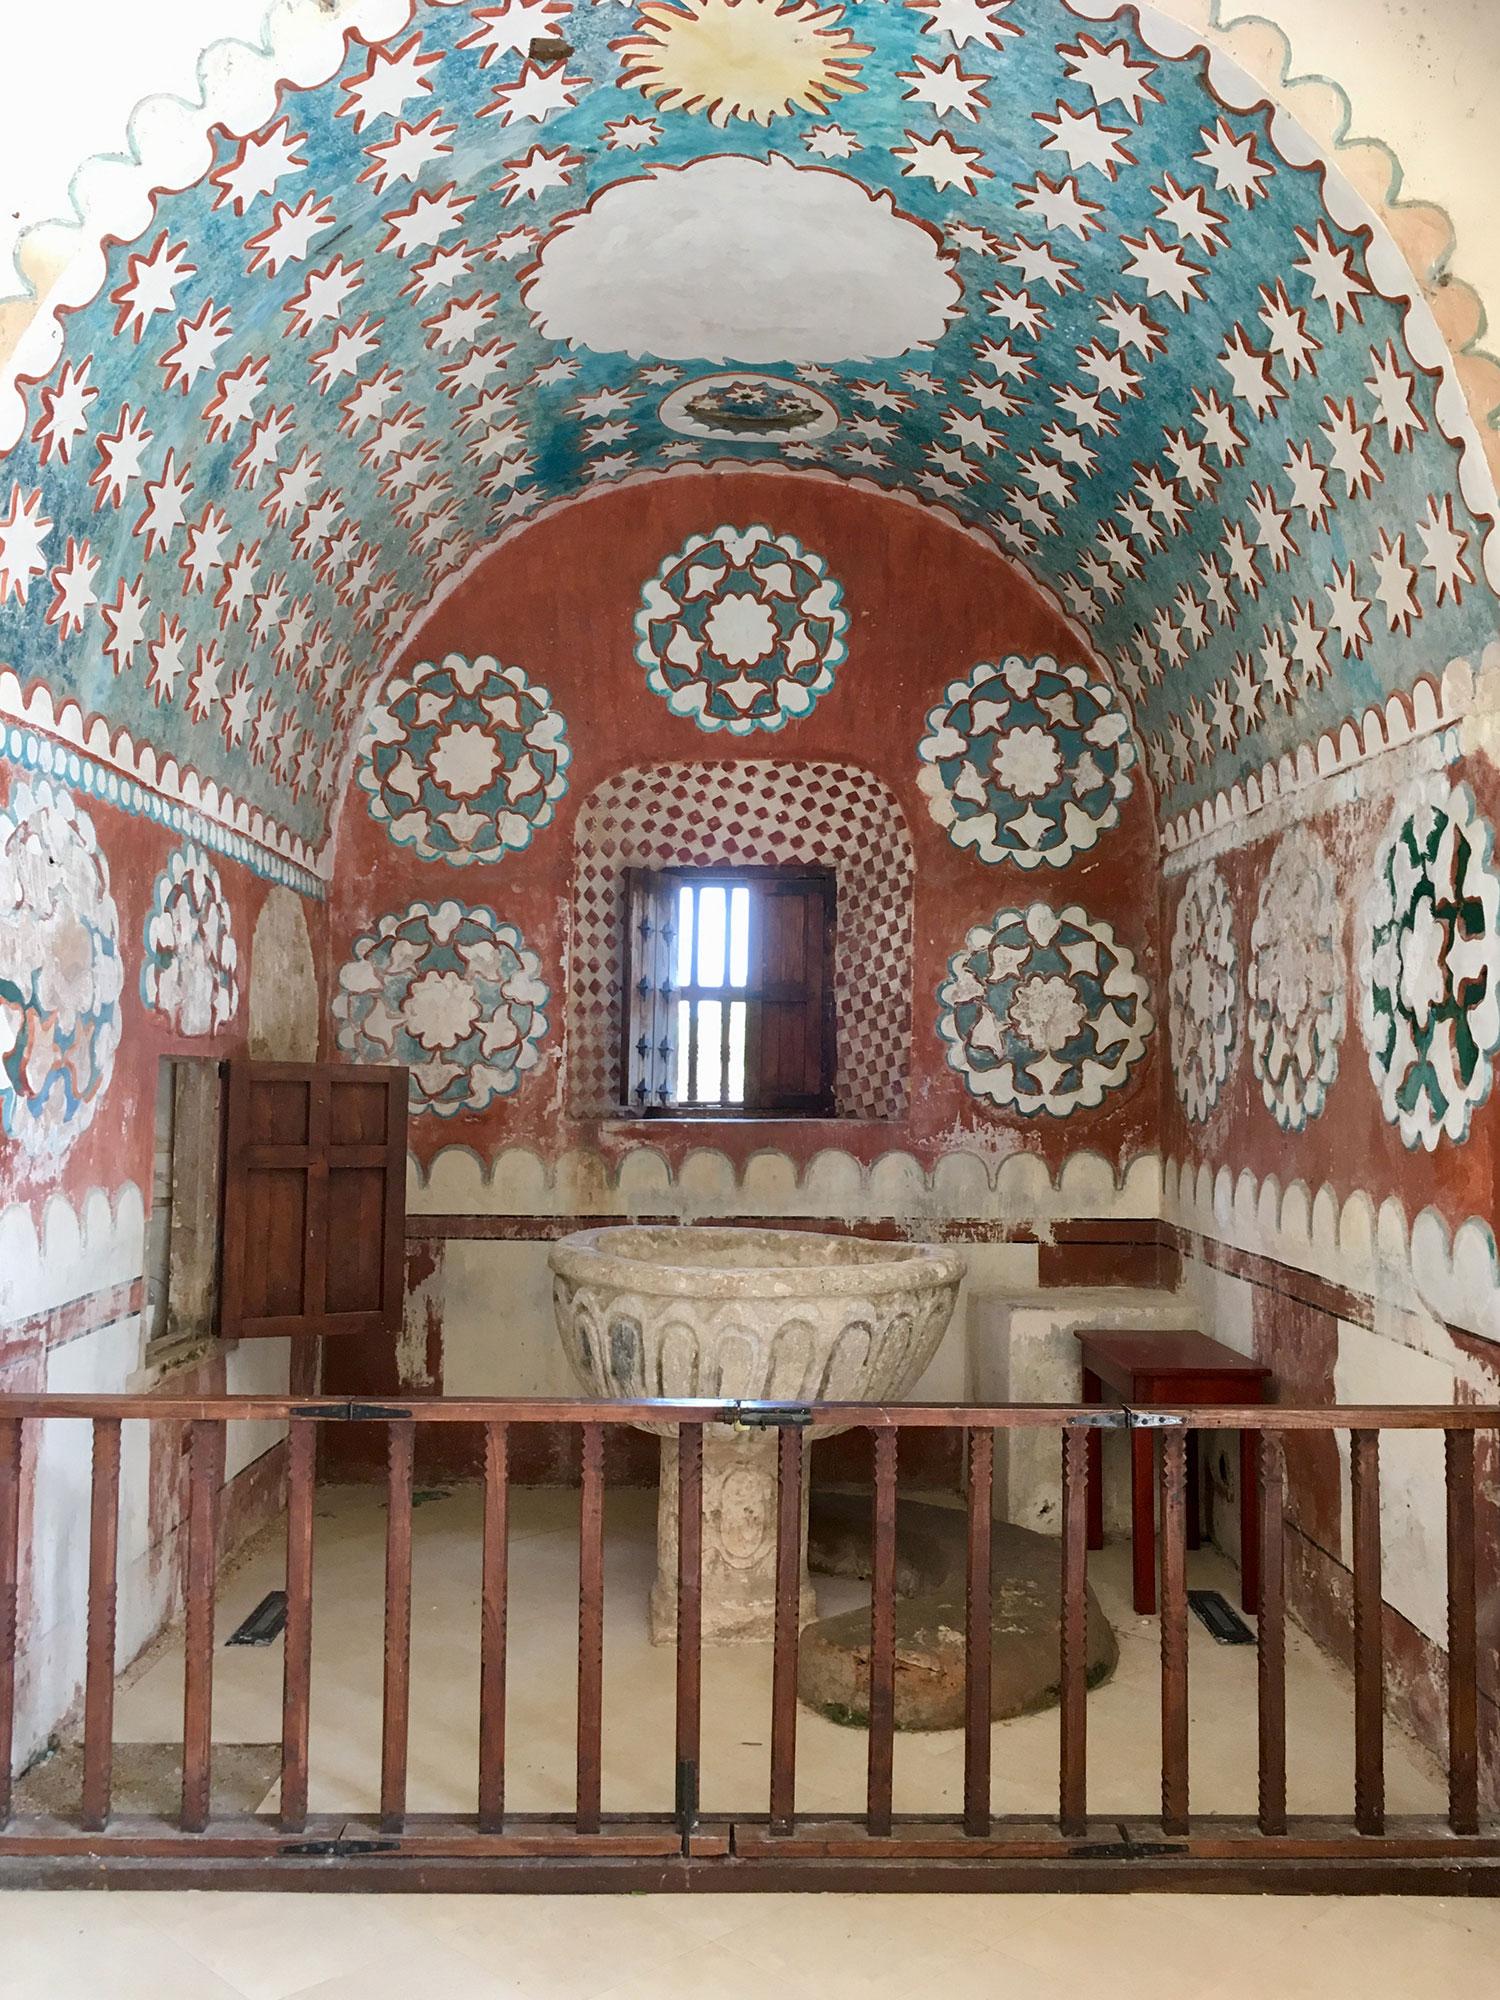 The church interior has the same decorative motifs as the exterior.